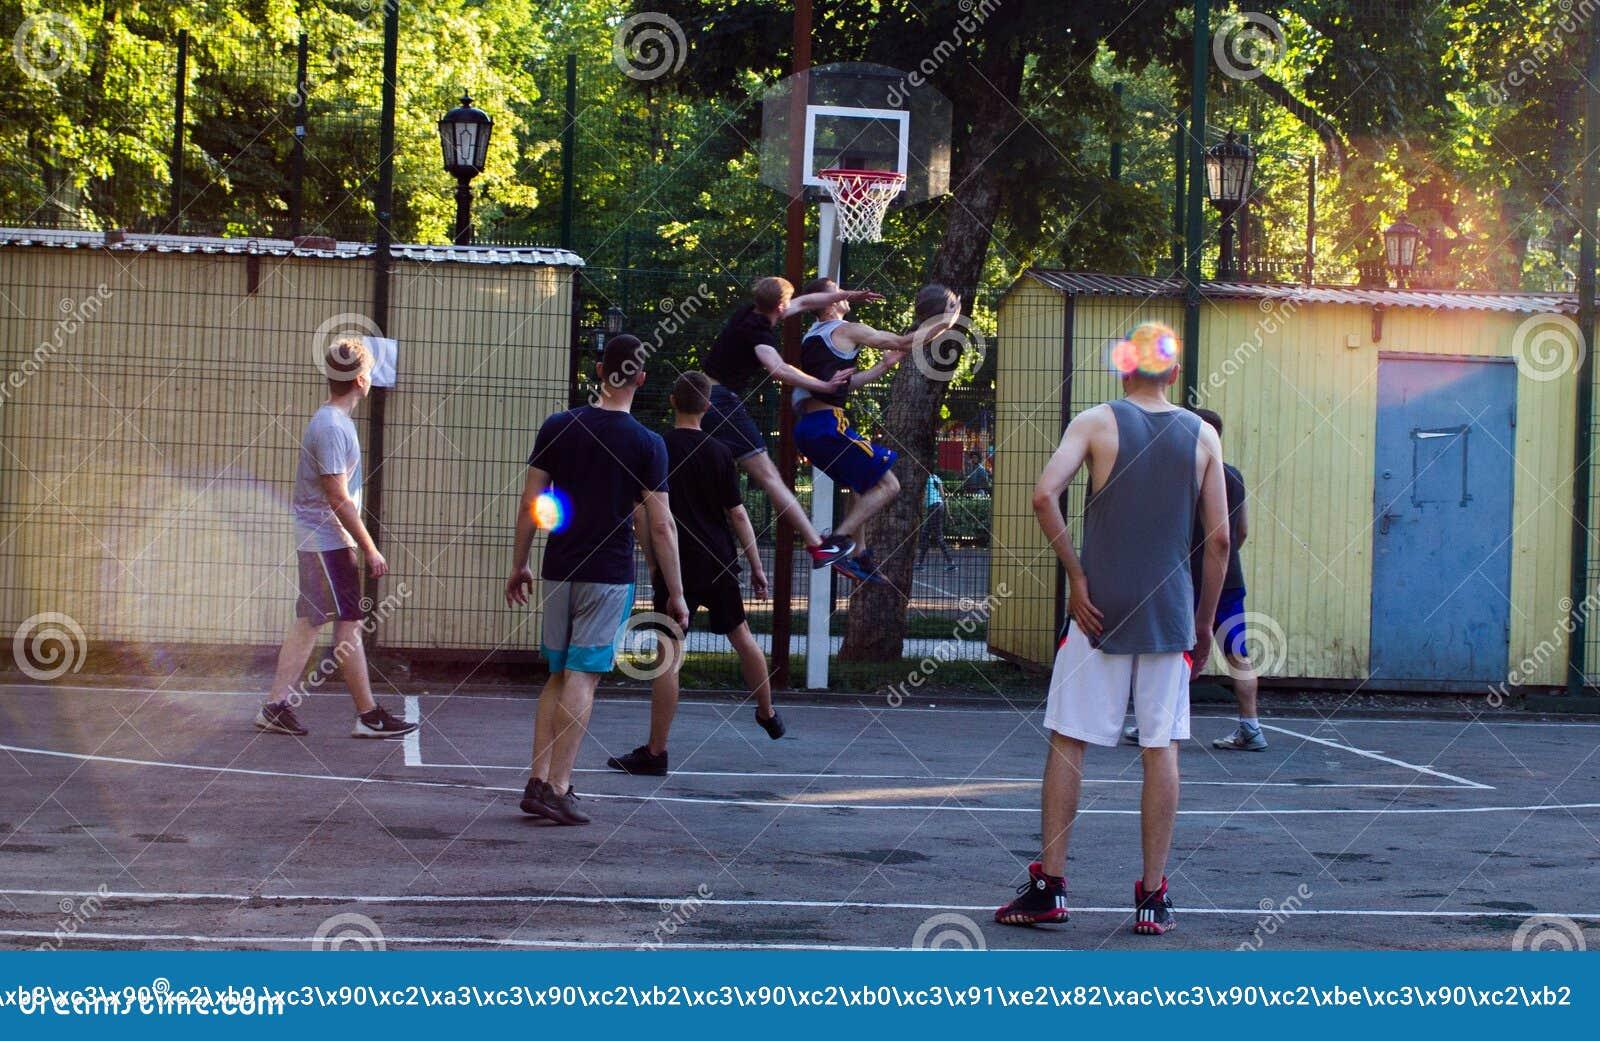 Игры молодые люди баскетбола улицы